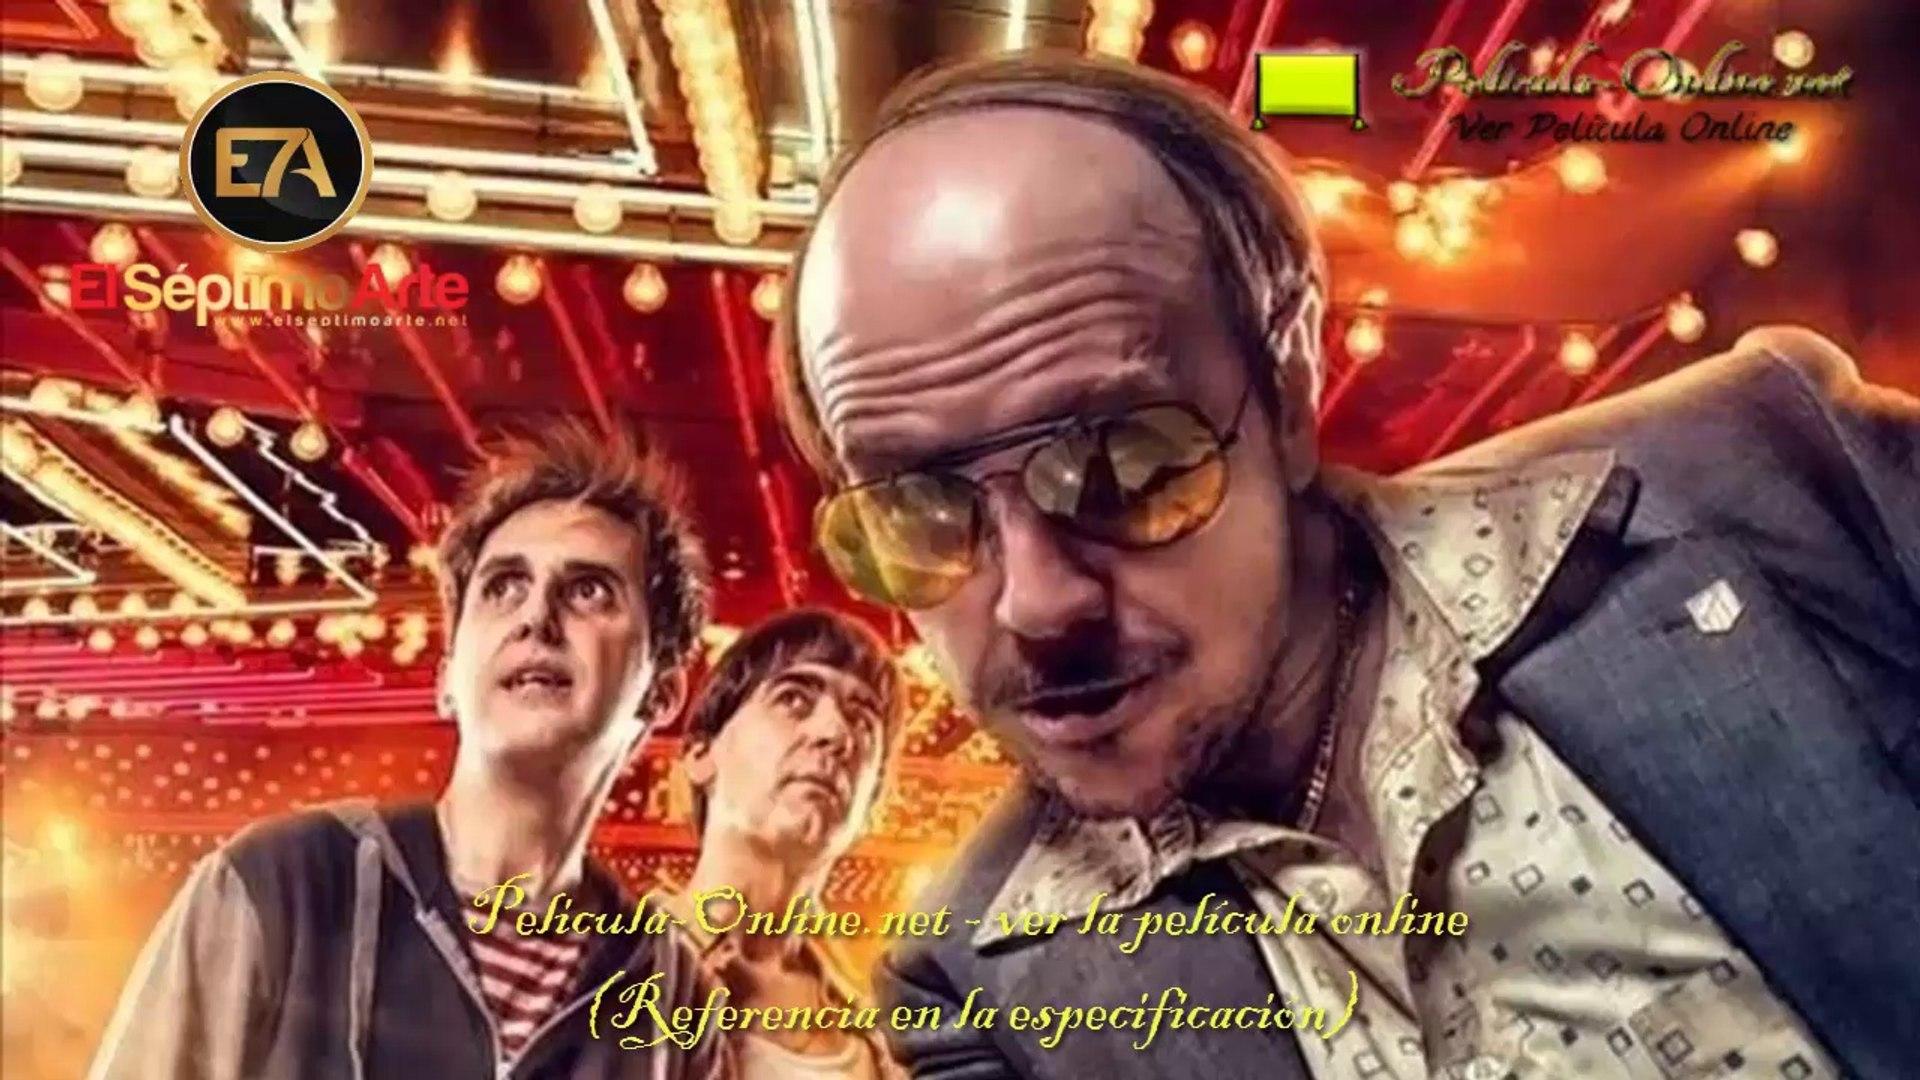 Torrente 5 Operacion Eurovegas Full Movie Online Gratis Espanol Latino Video Dailymotion